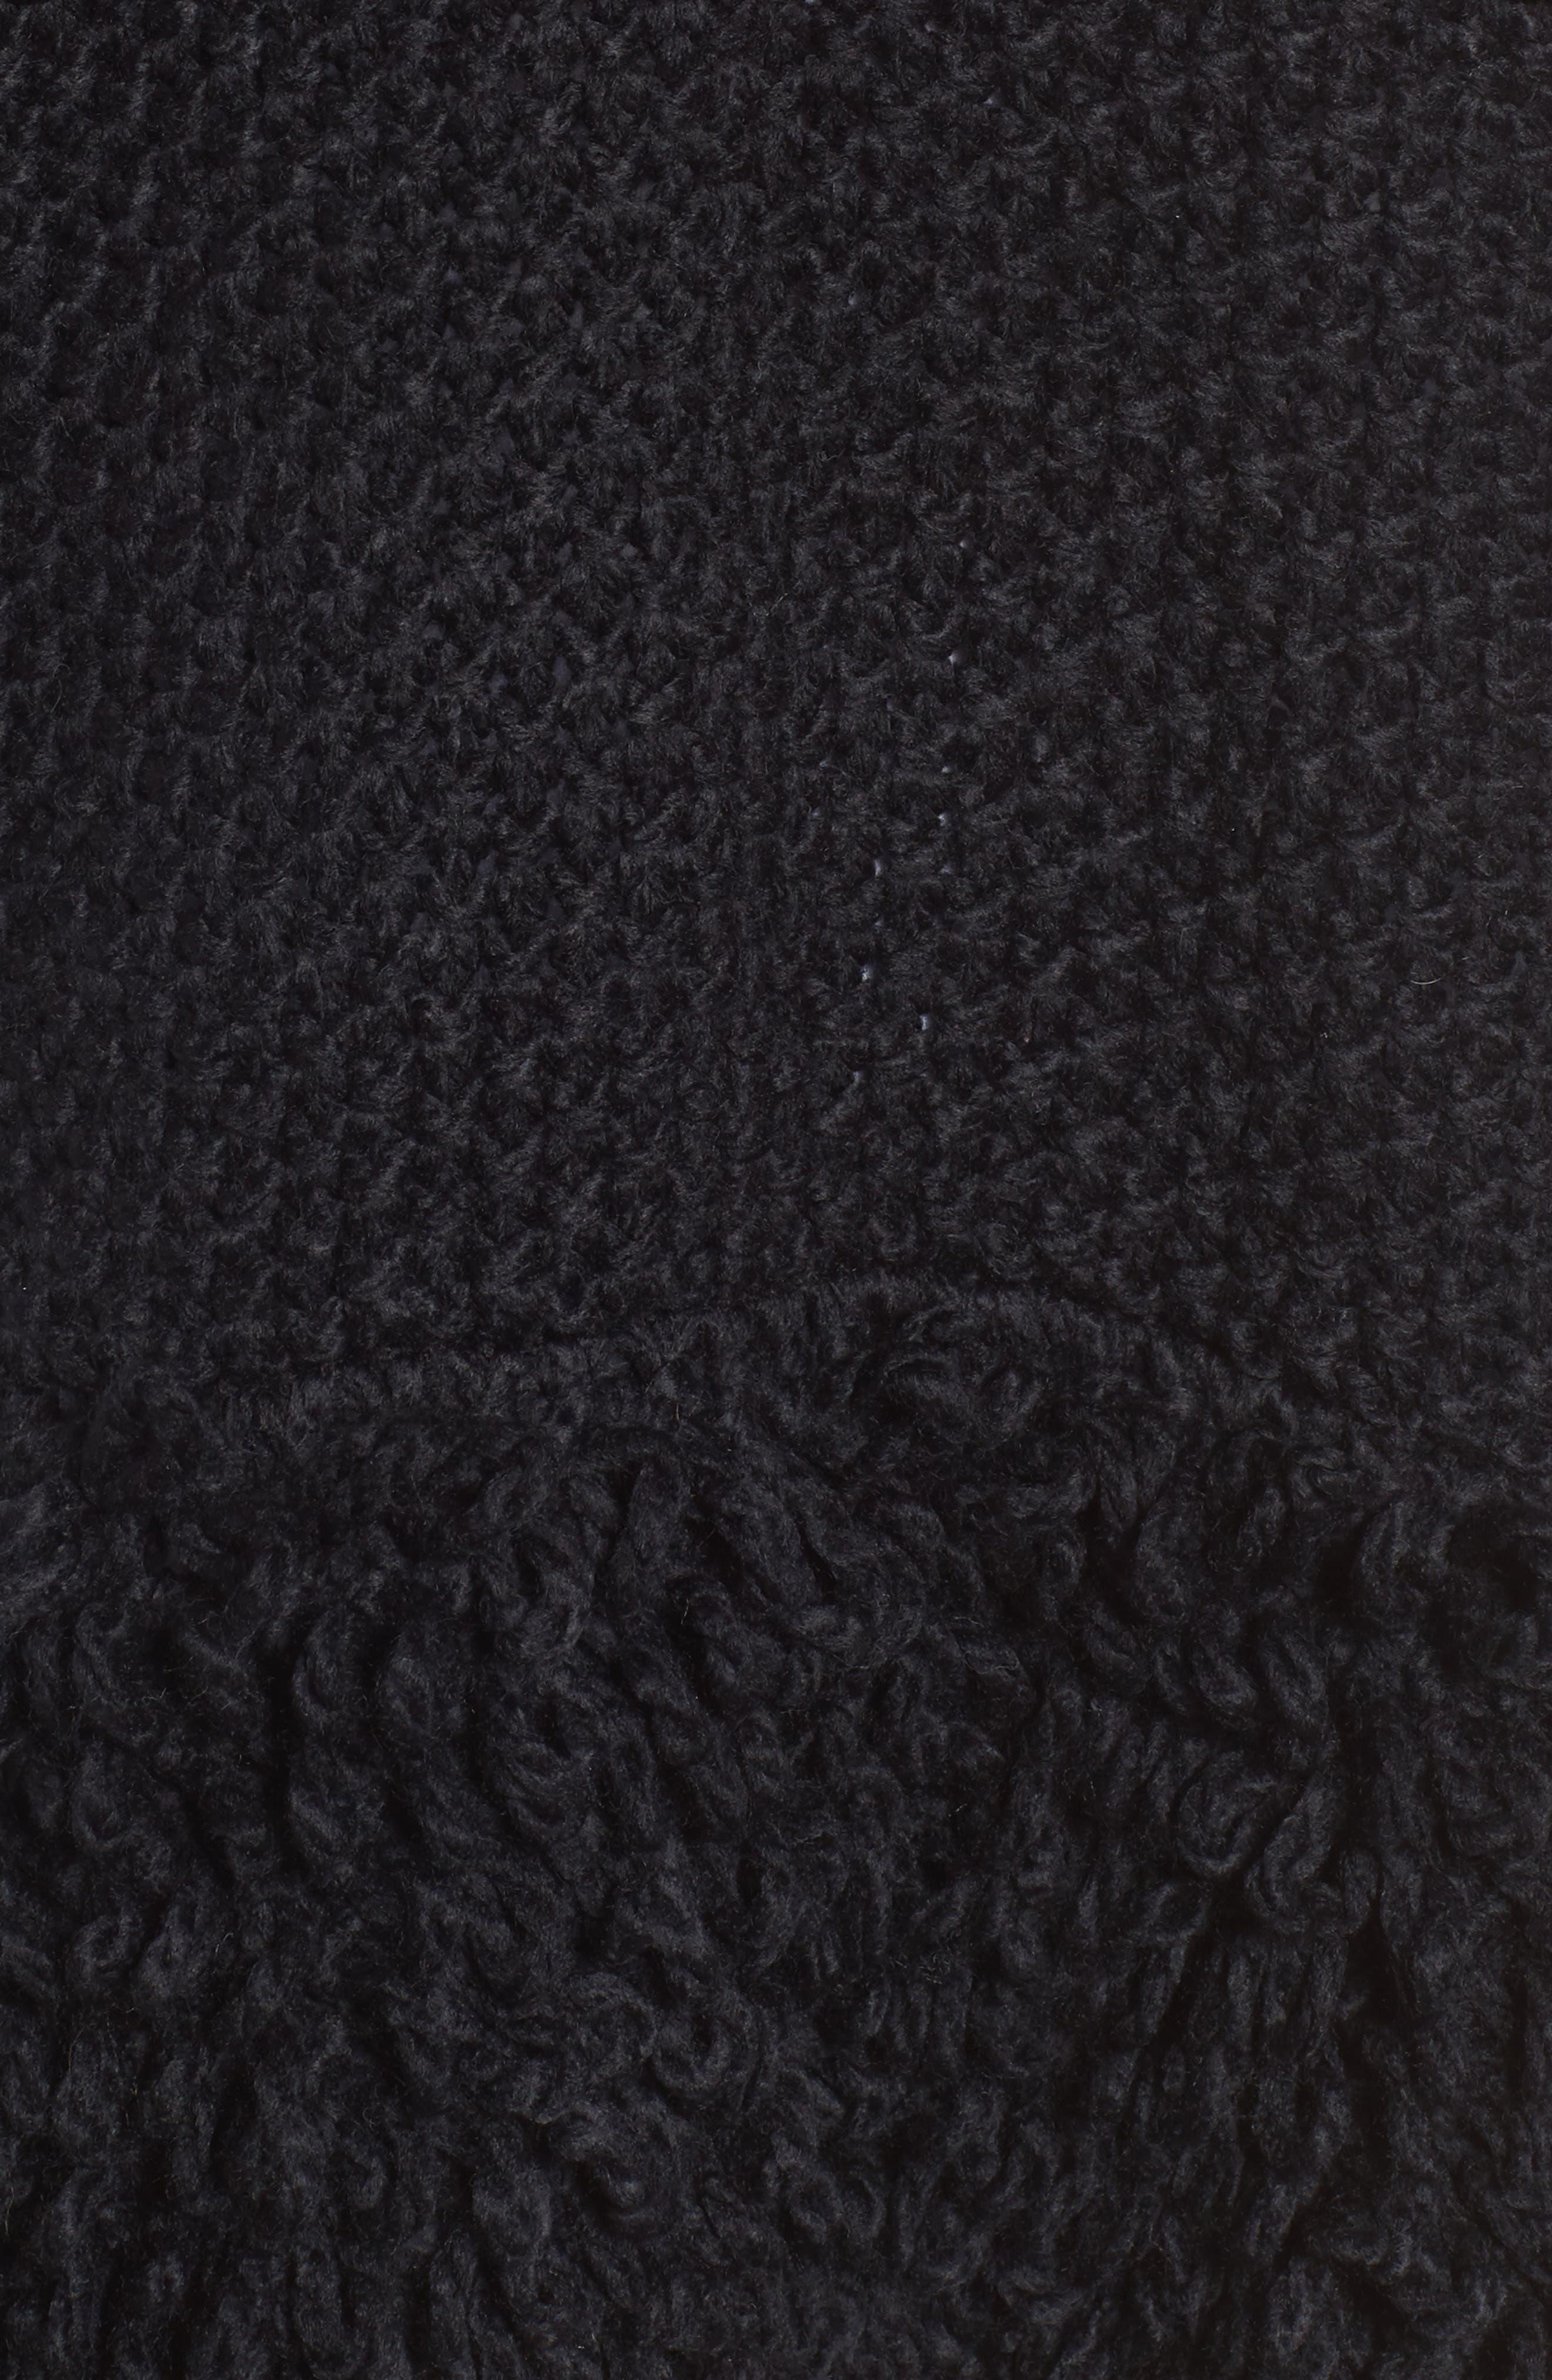 Knit Poncho,                             Alternate thumbnail 5, color,                             Black